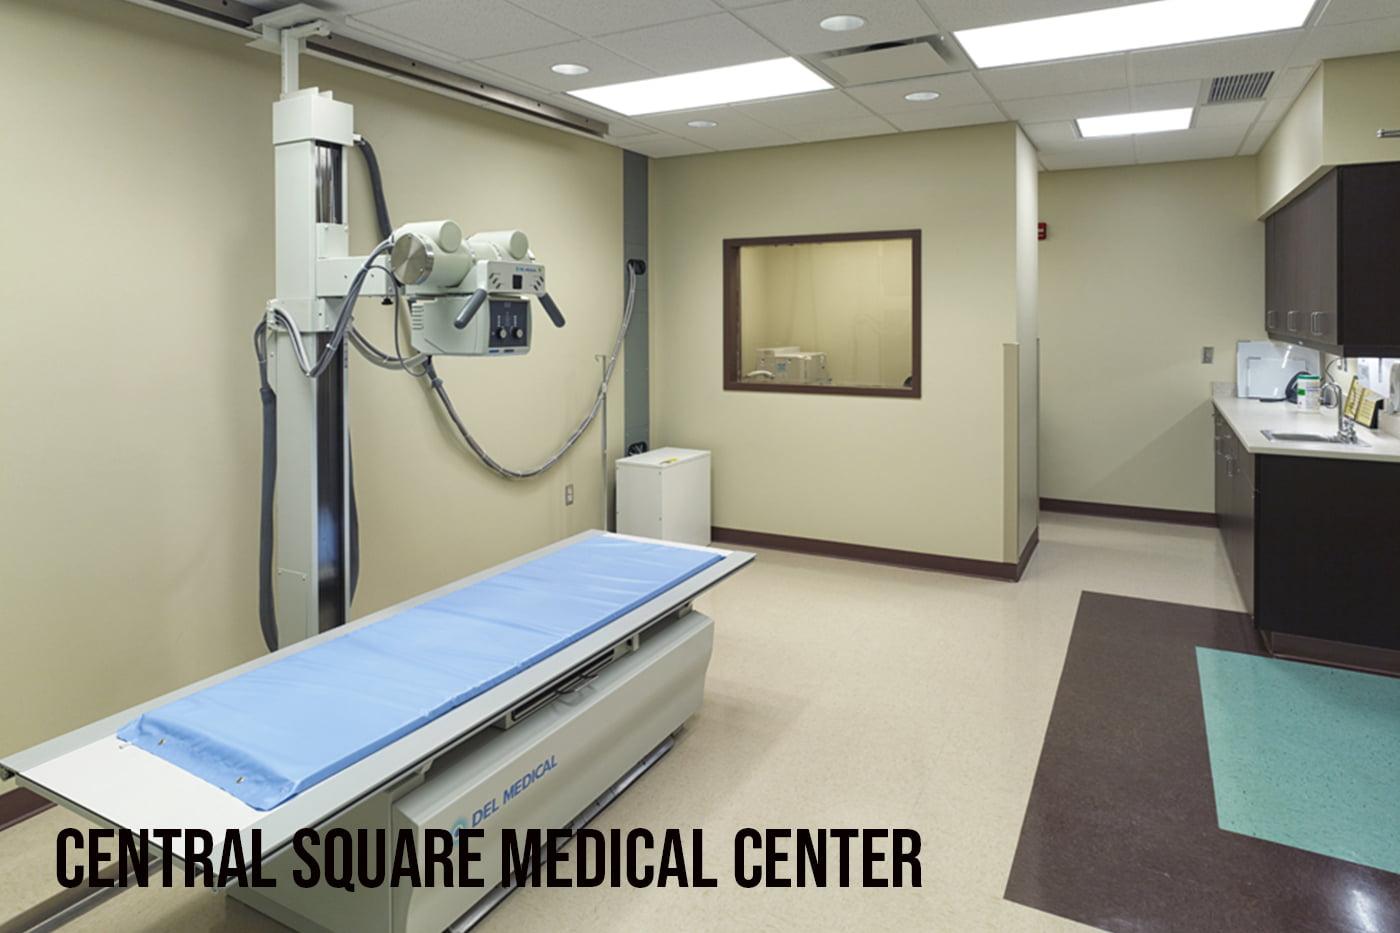 Central Square Medical Center